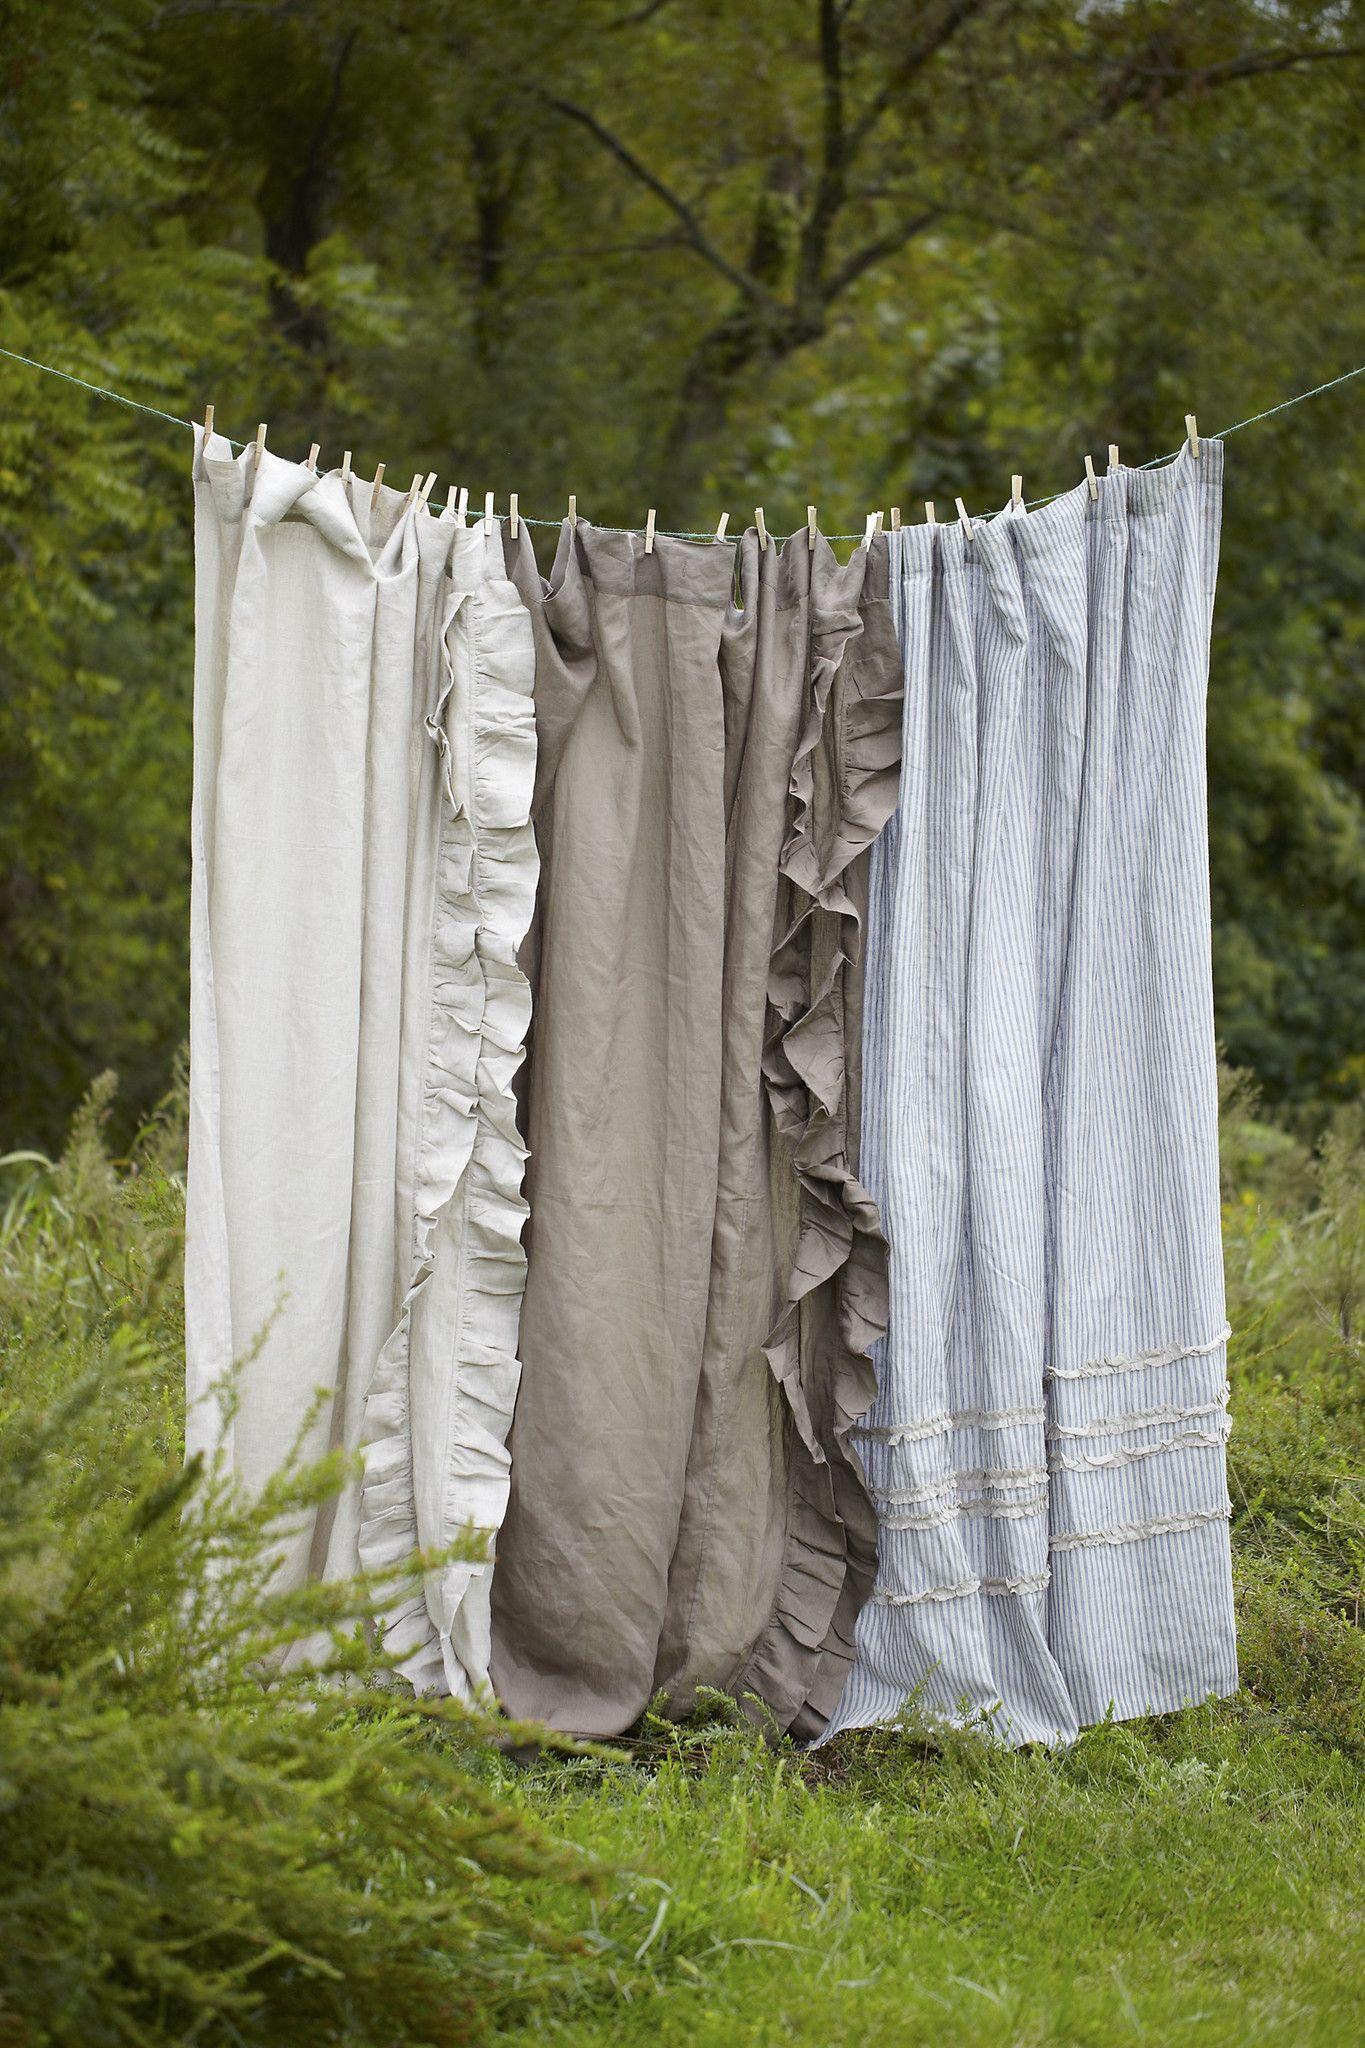 Farmhouse Linen Shower Curtain Collection Linen Curtains Curtains Ruffle Curtains